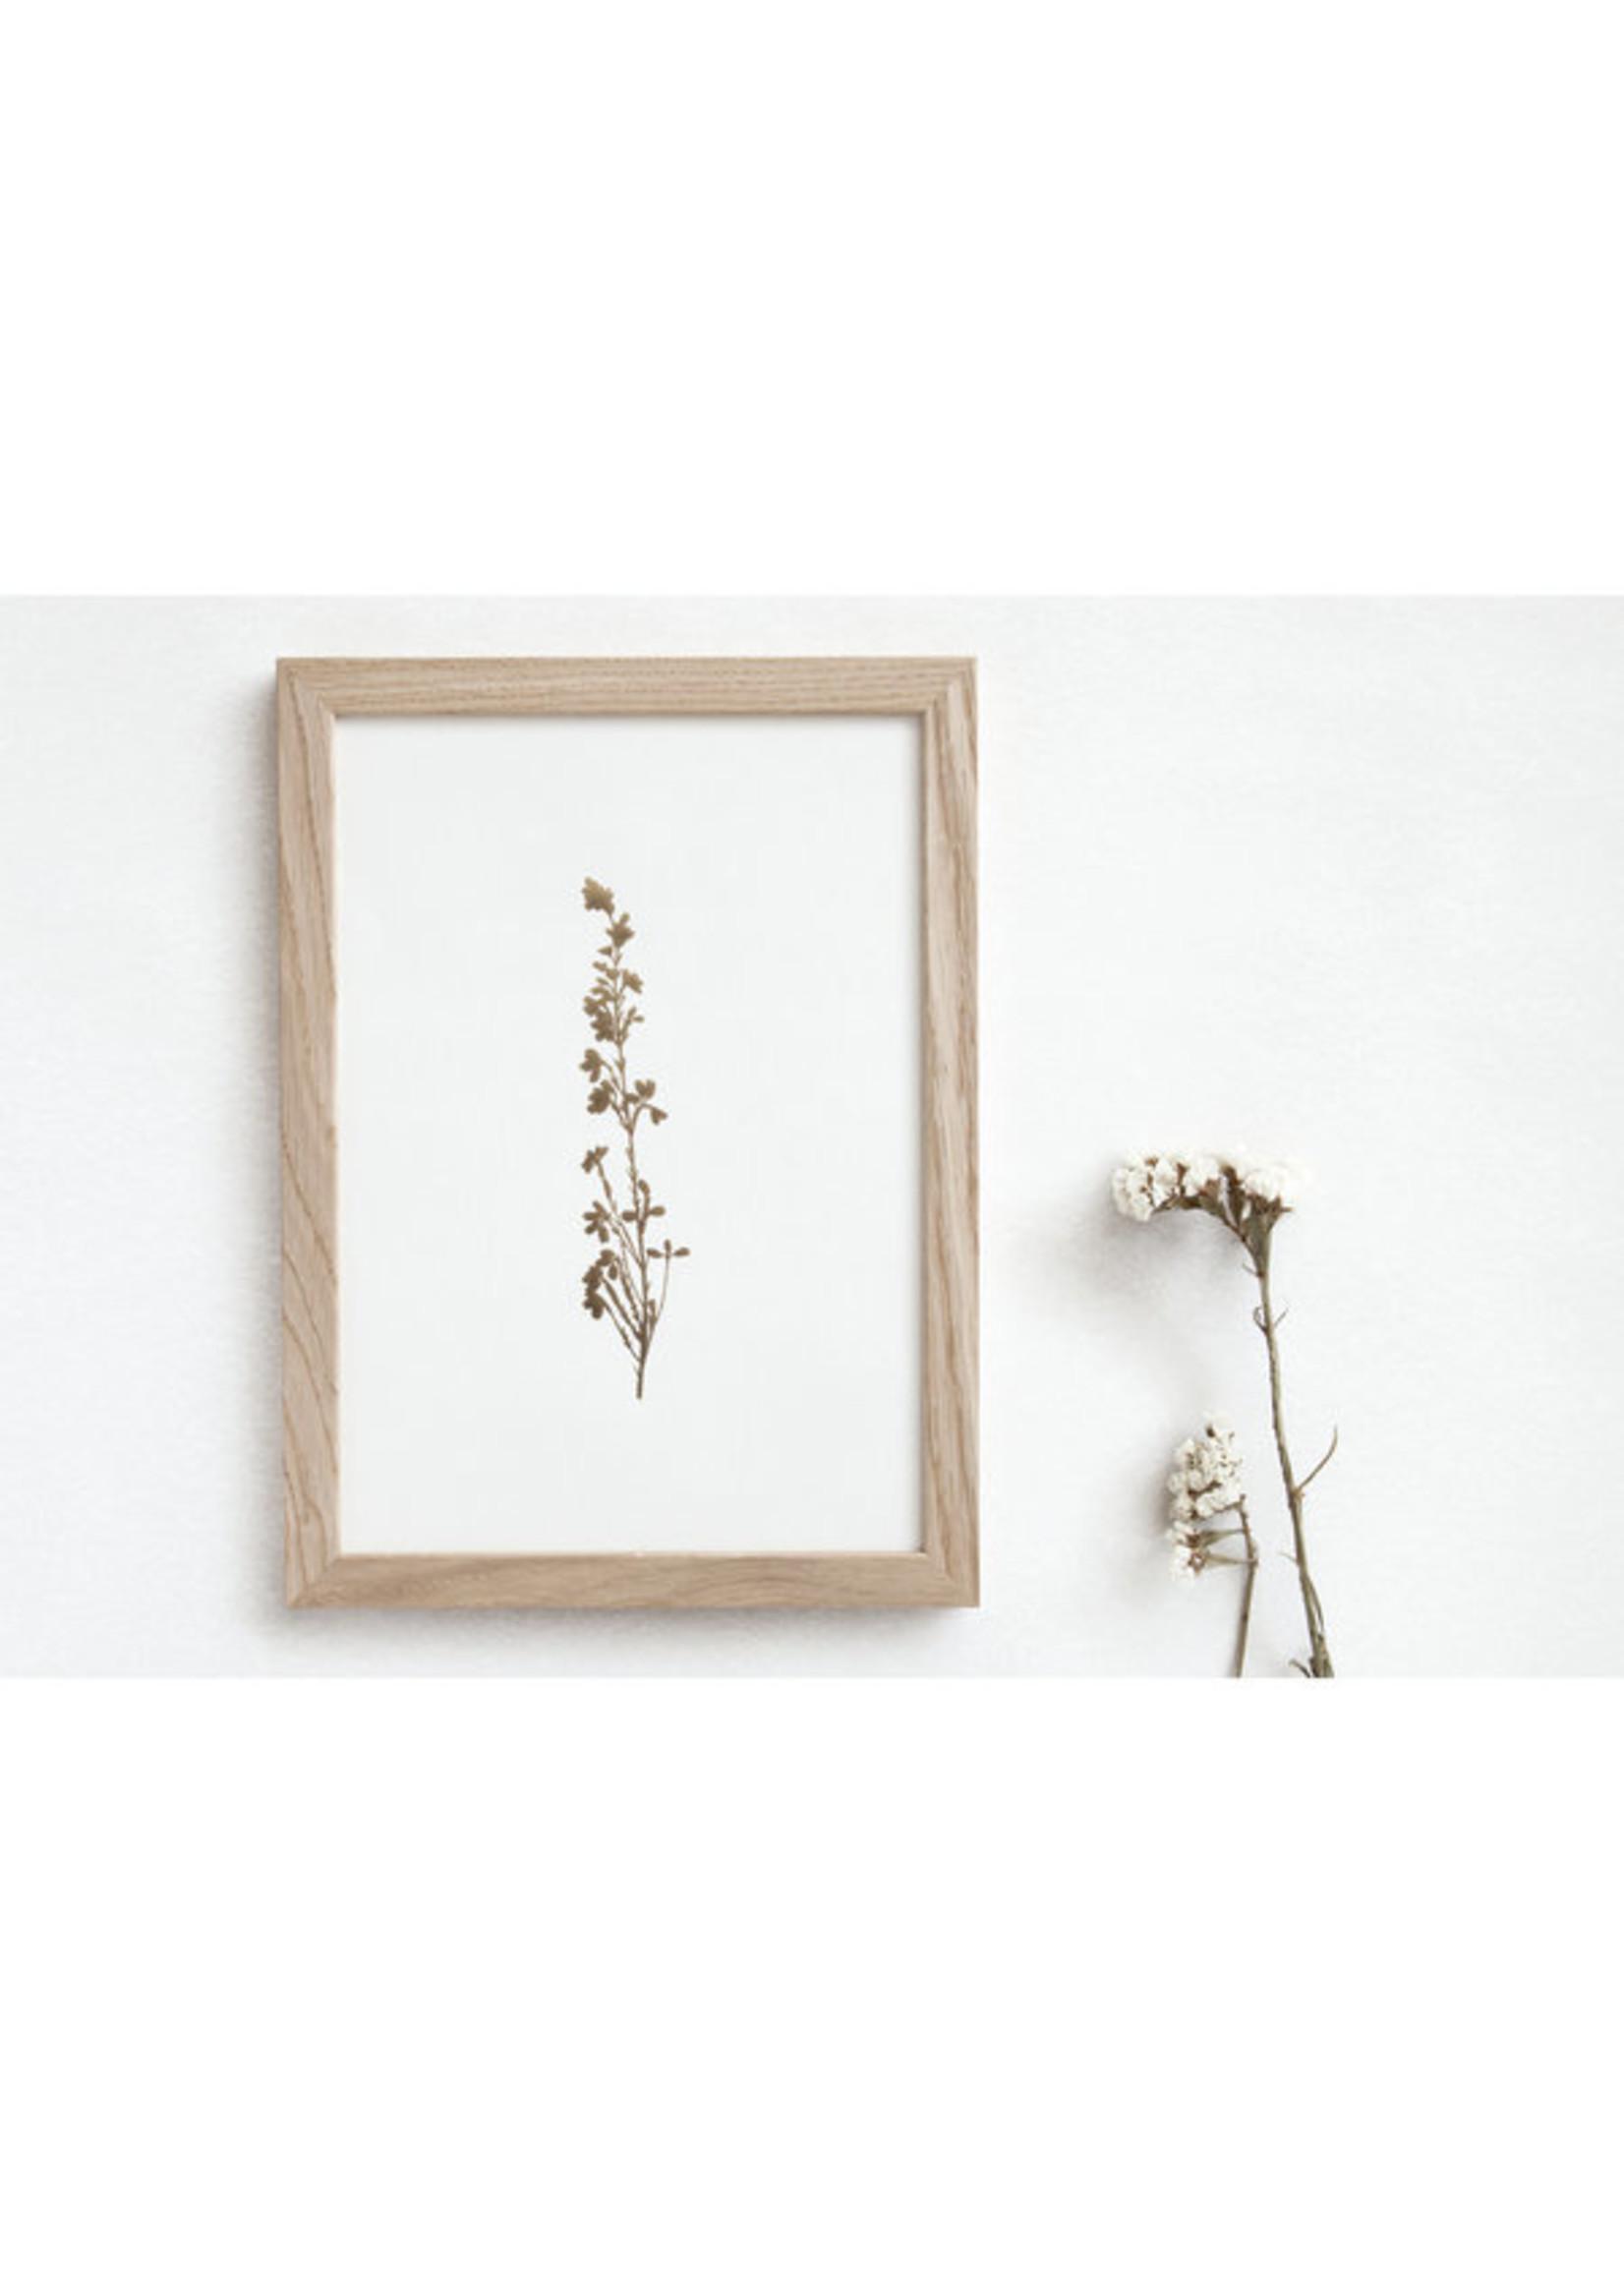 Ola Ola Foil Blocked Print Botanical Collection - Heather Ivory/Brass